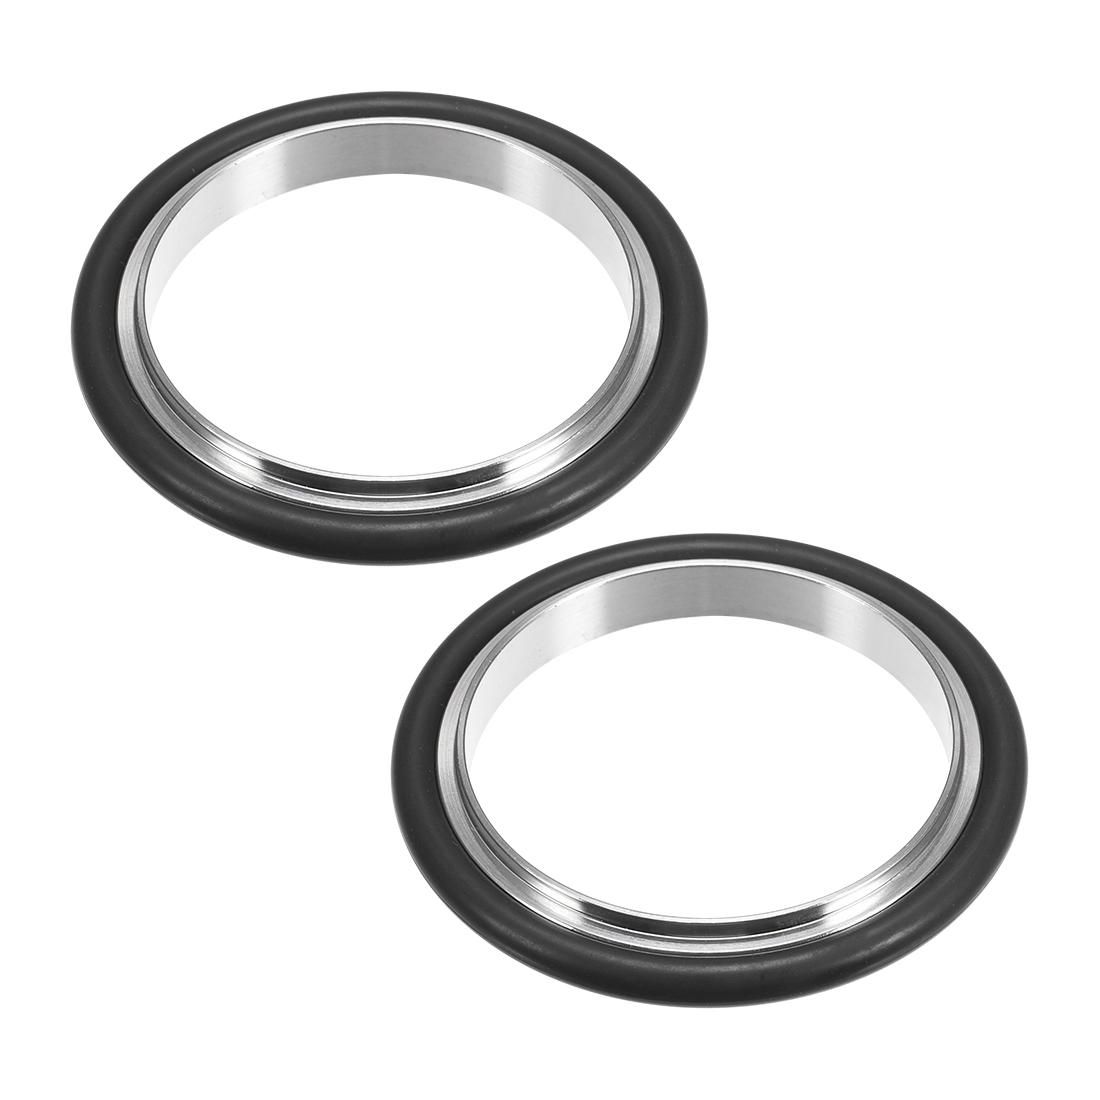 2 Pcs Centering Ring KF-16 Vacuum Fittings ISO-KF Flange 66mm x 49.7mm